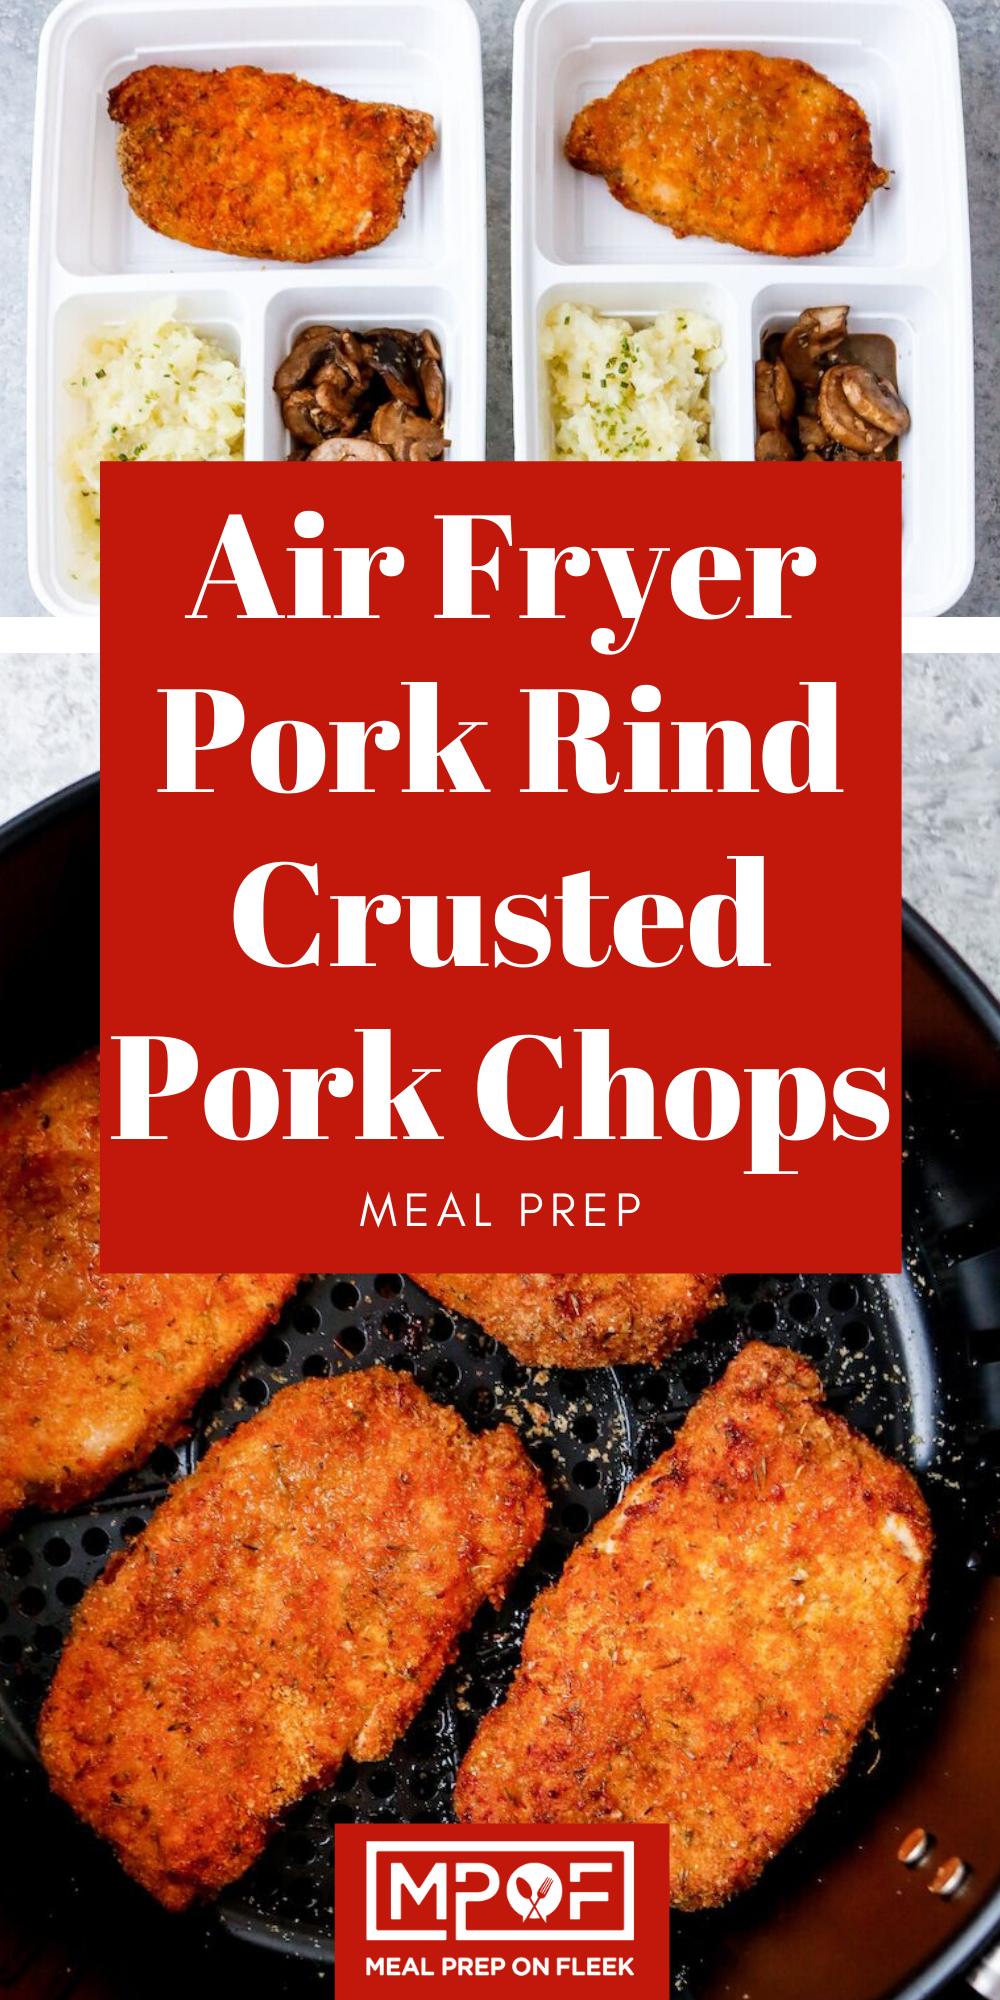 Air Fryer Pork Rind Coated Pork Chops